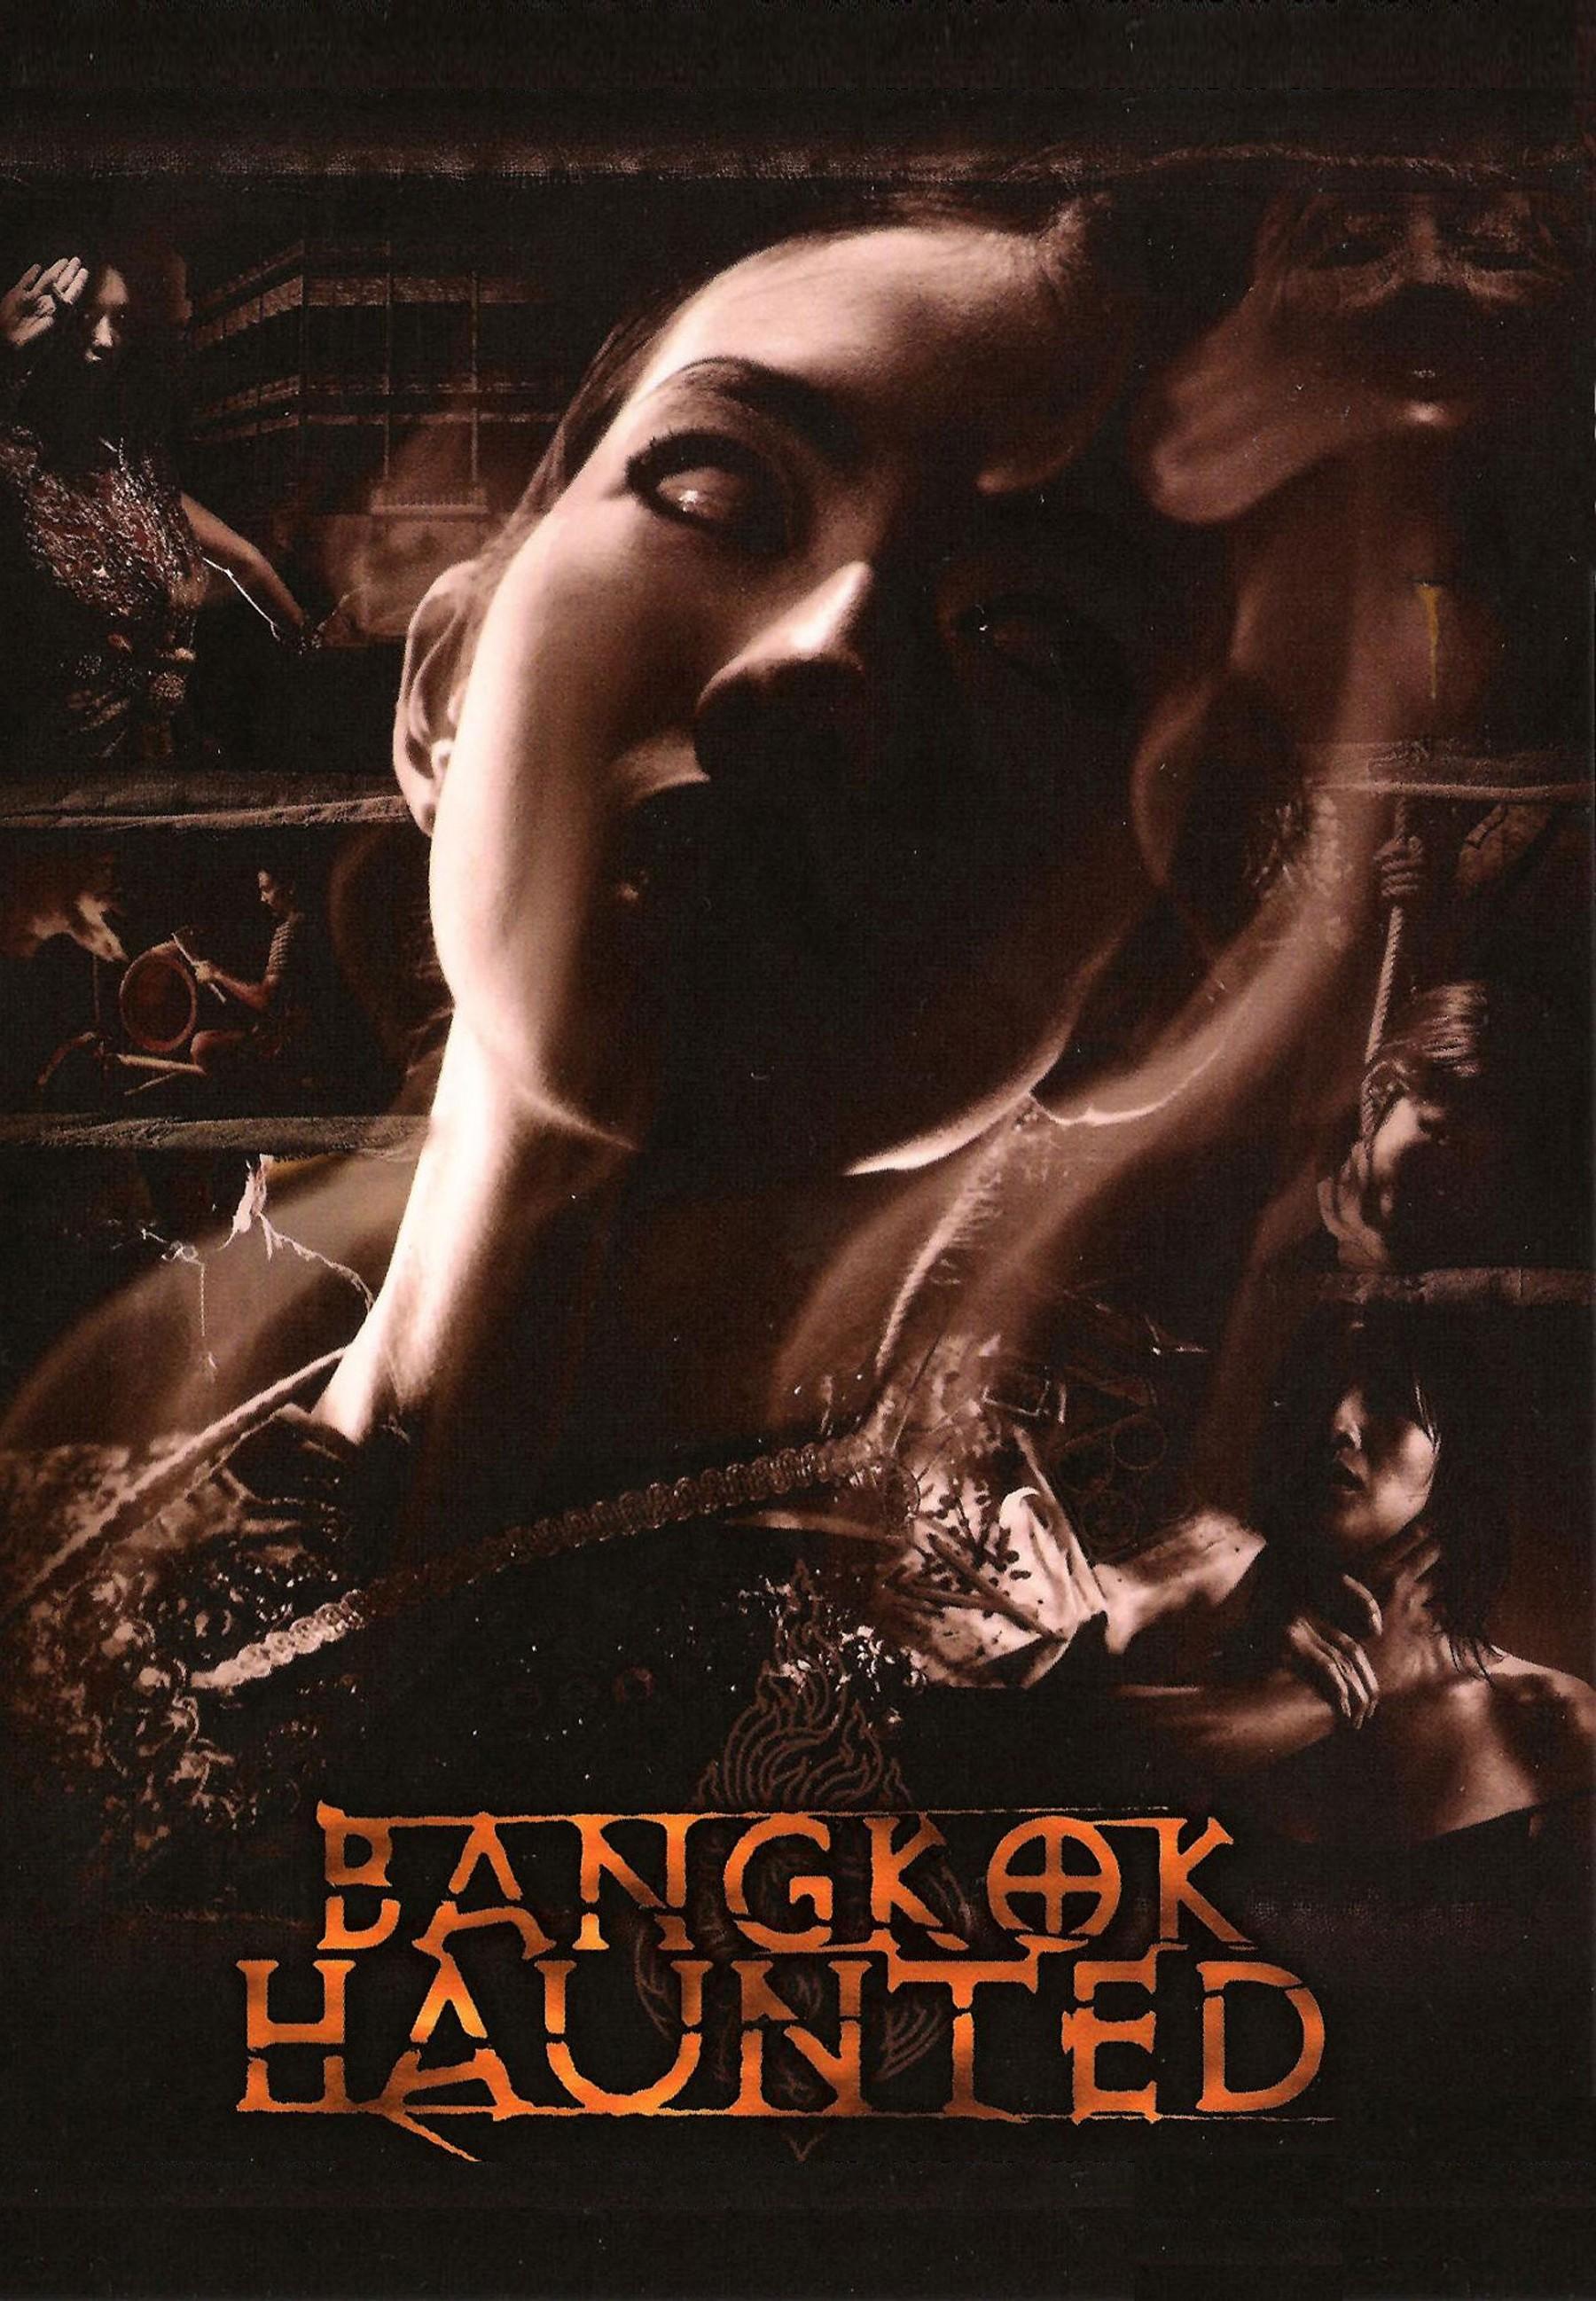 [MULTI] Bangkok Haunted [DVDRiP]